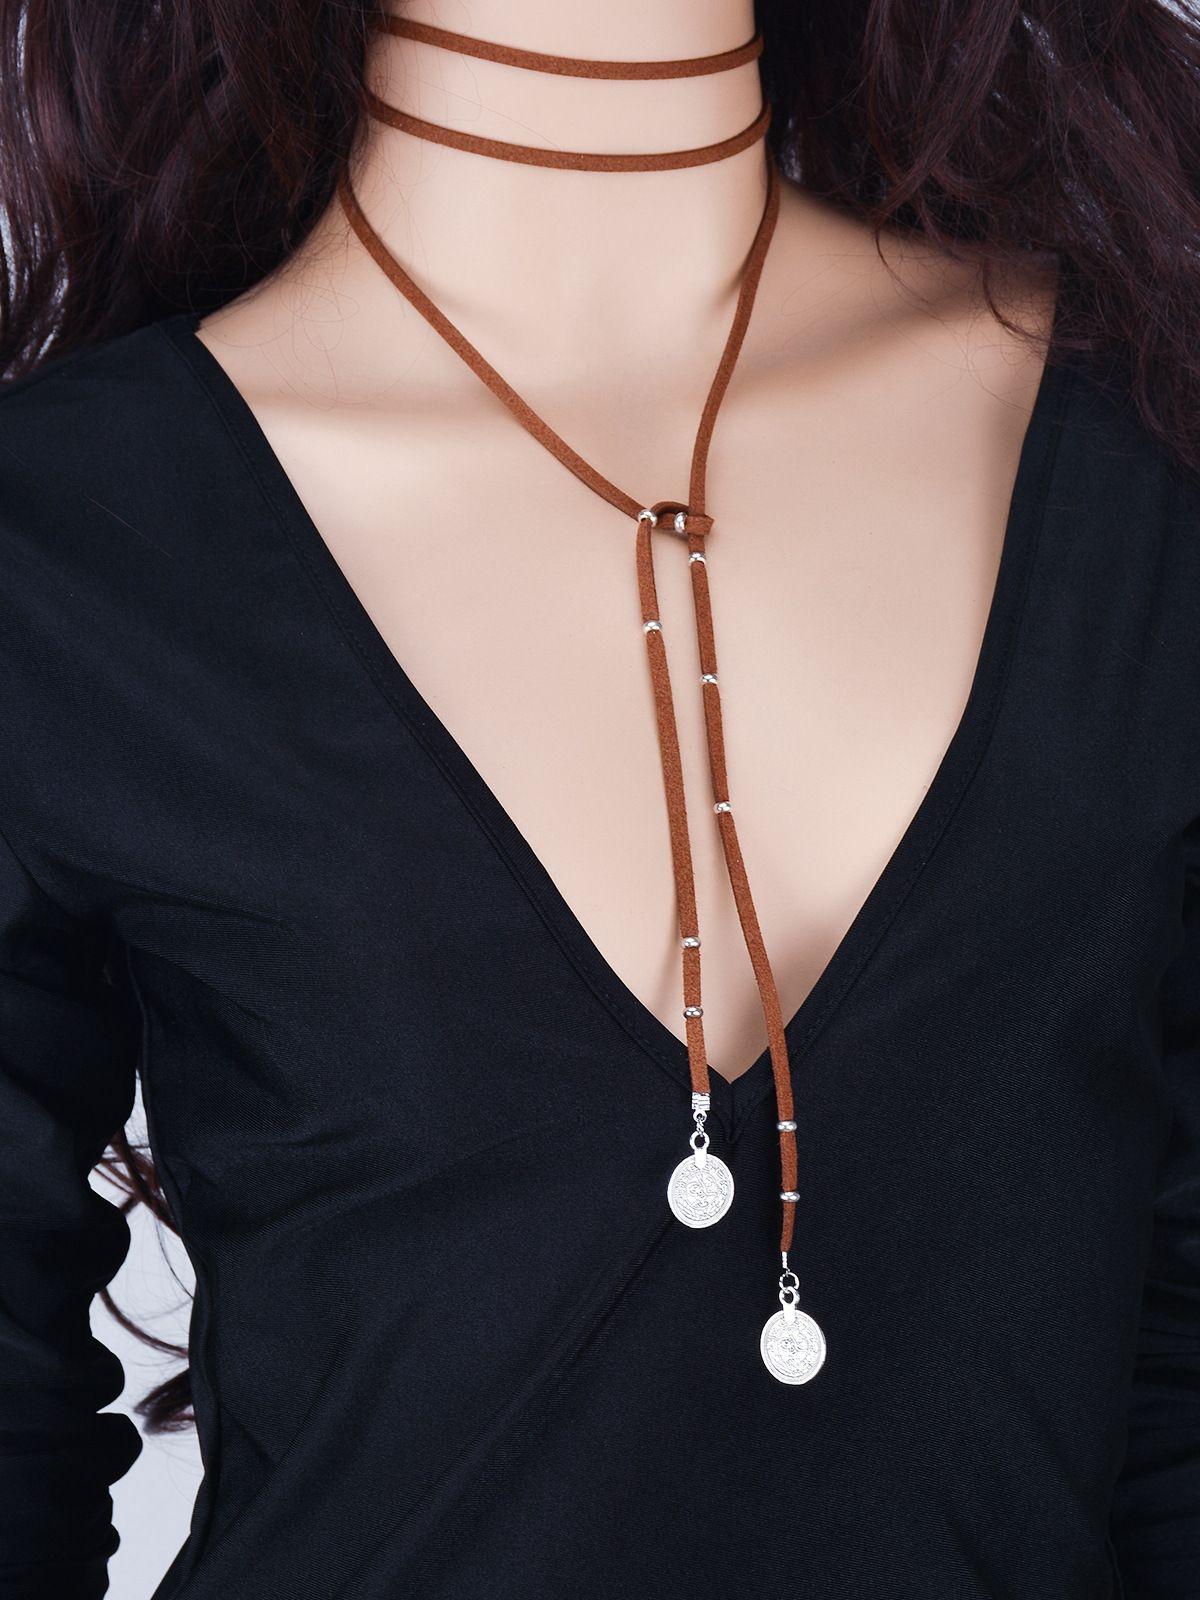 2018 Hot Sale High Quality Fashion Jewelry Lady Woman ...